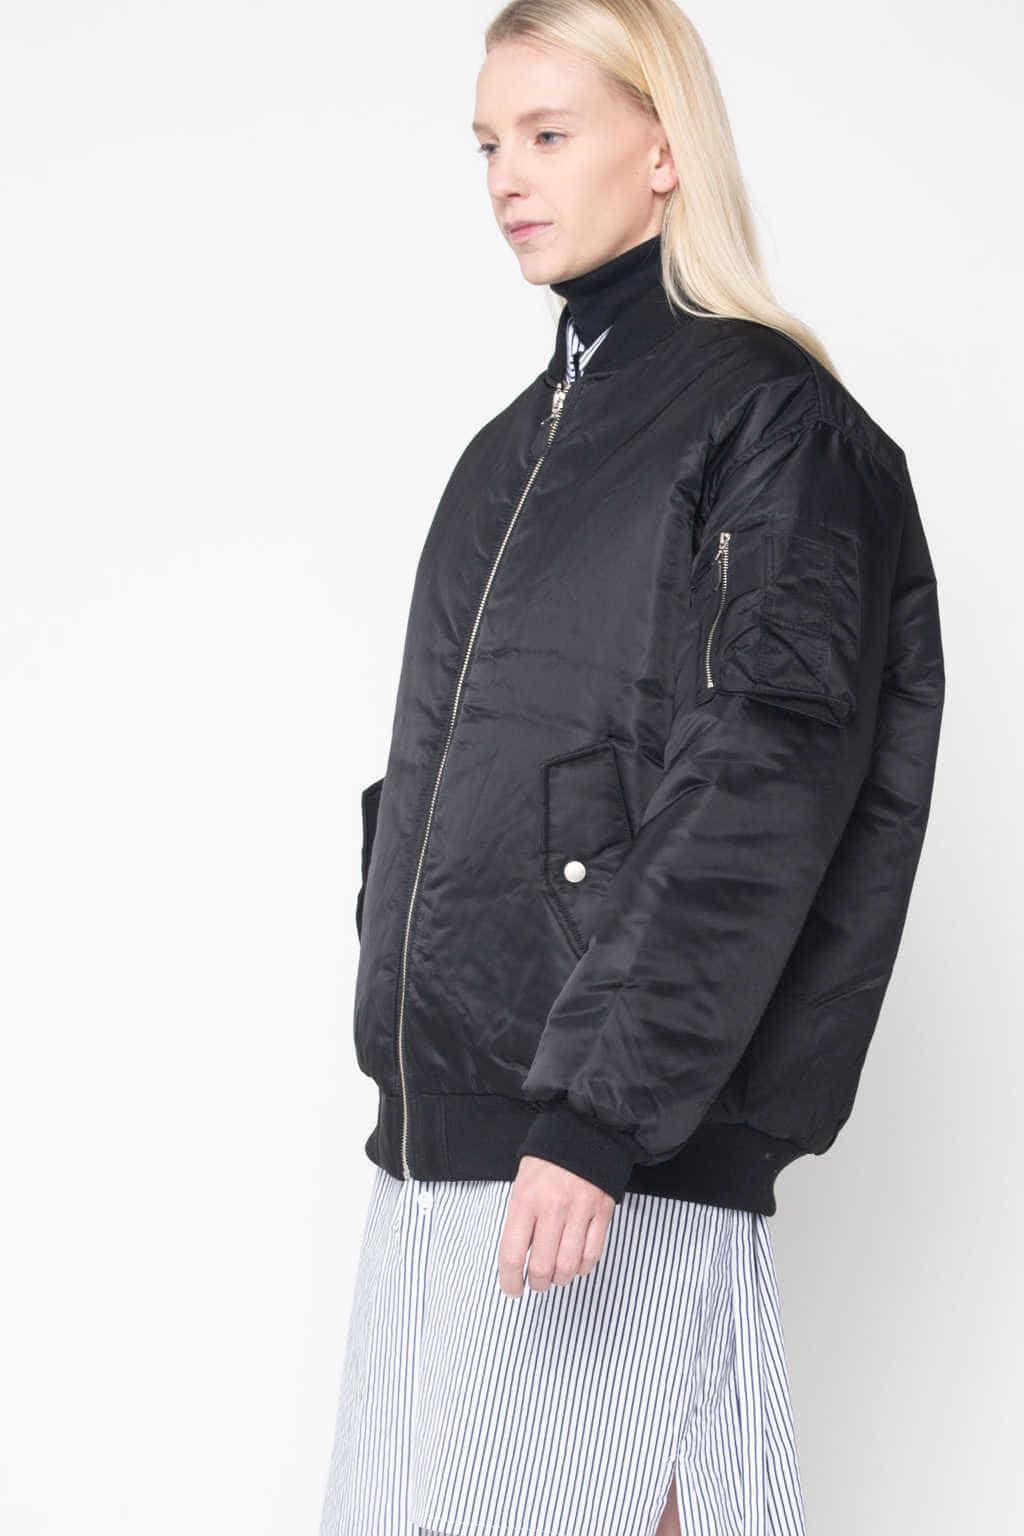 Jacket G33 Black 2